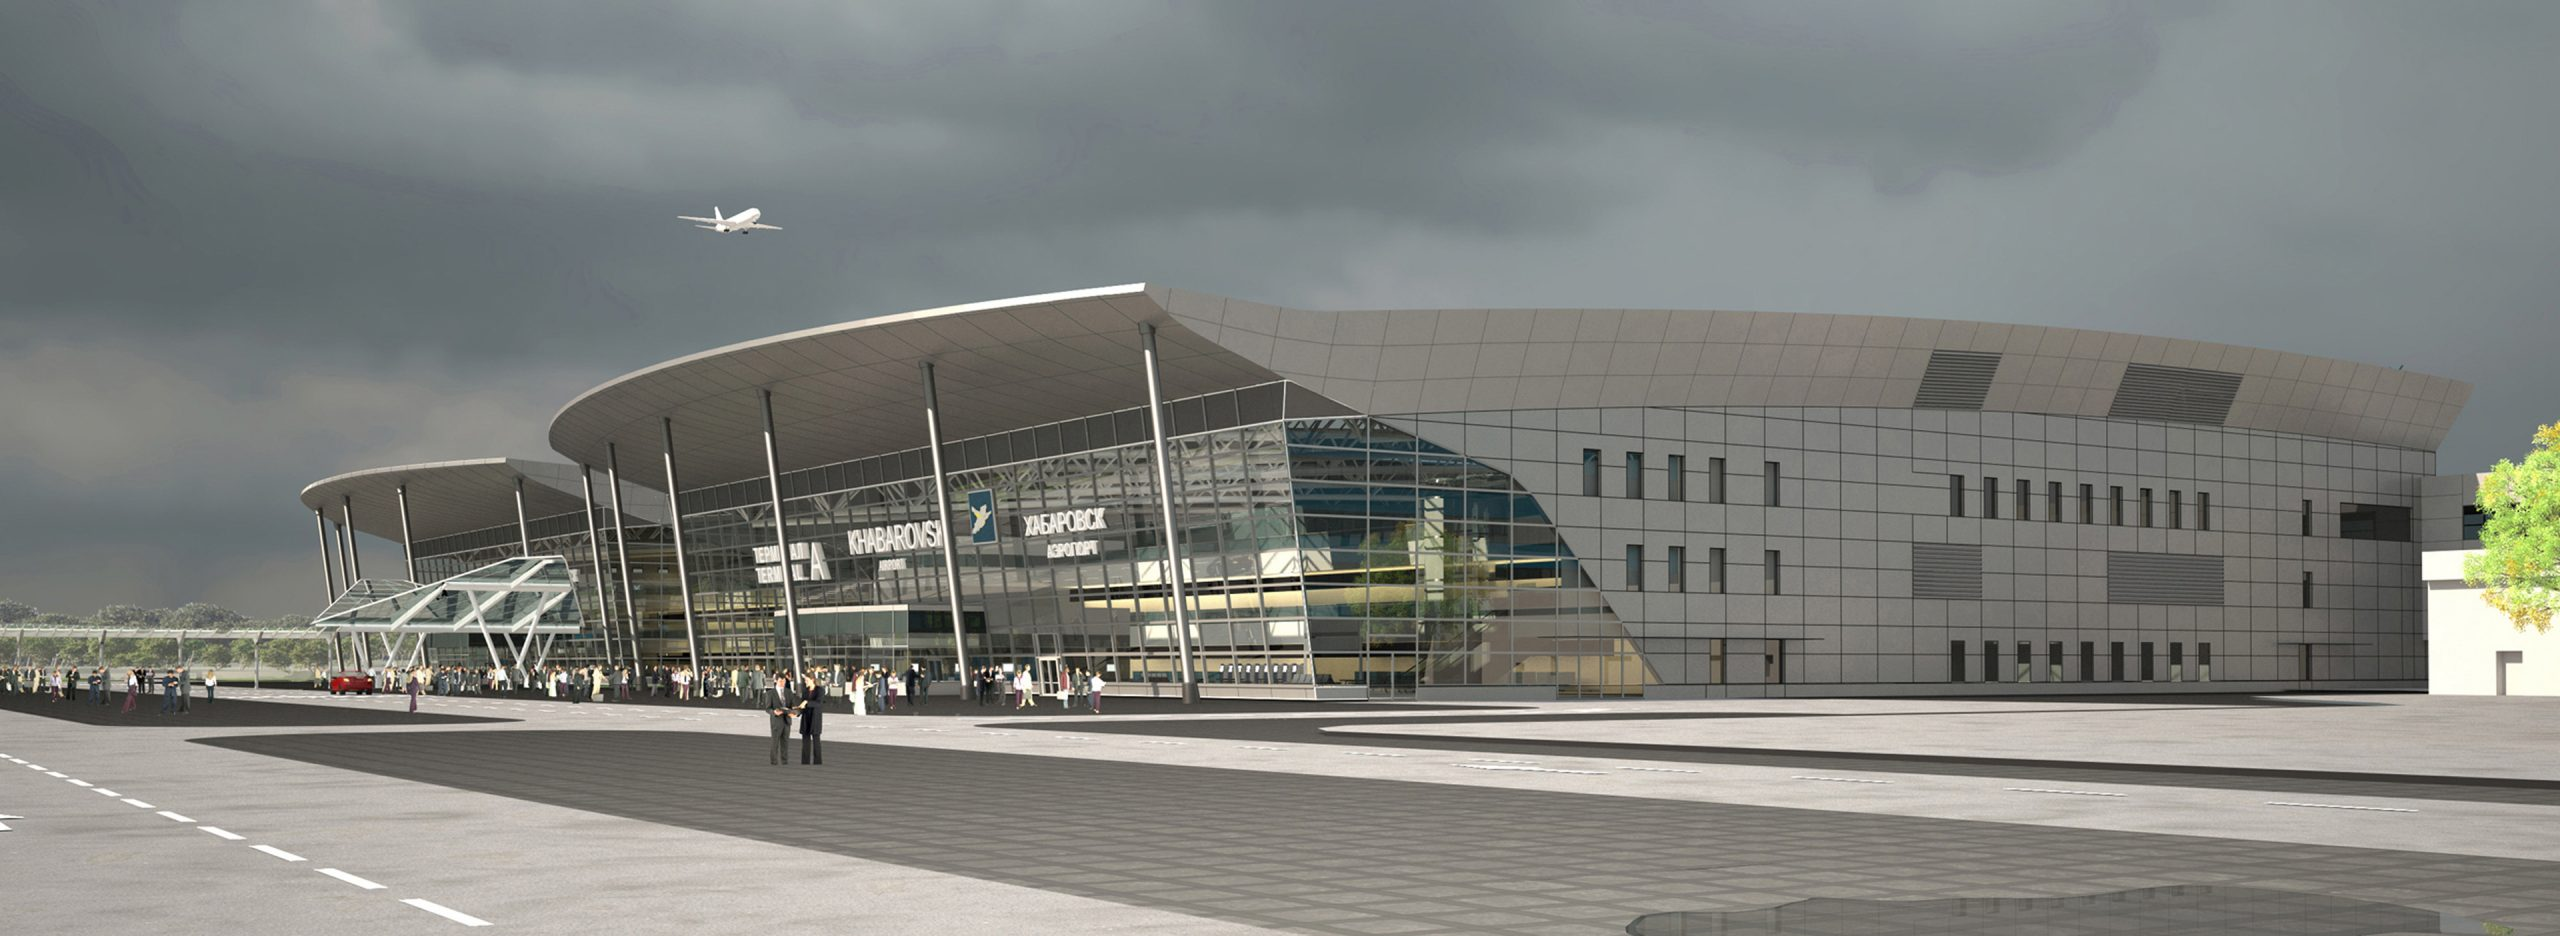 Международный аэропорт Хабаровска